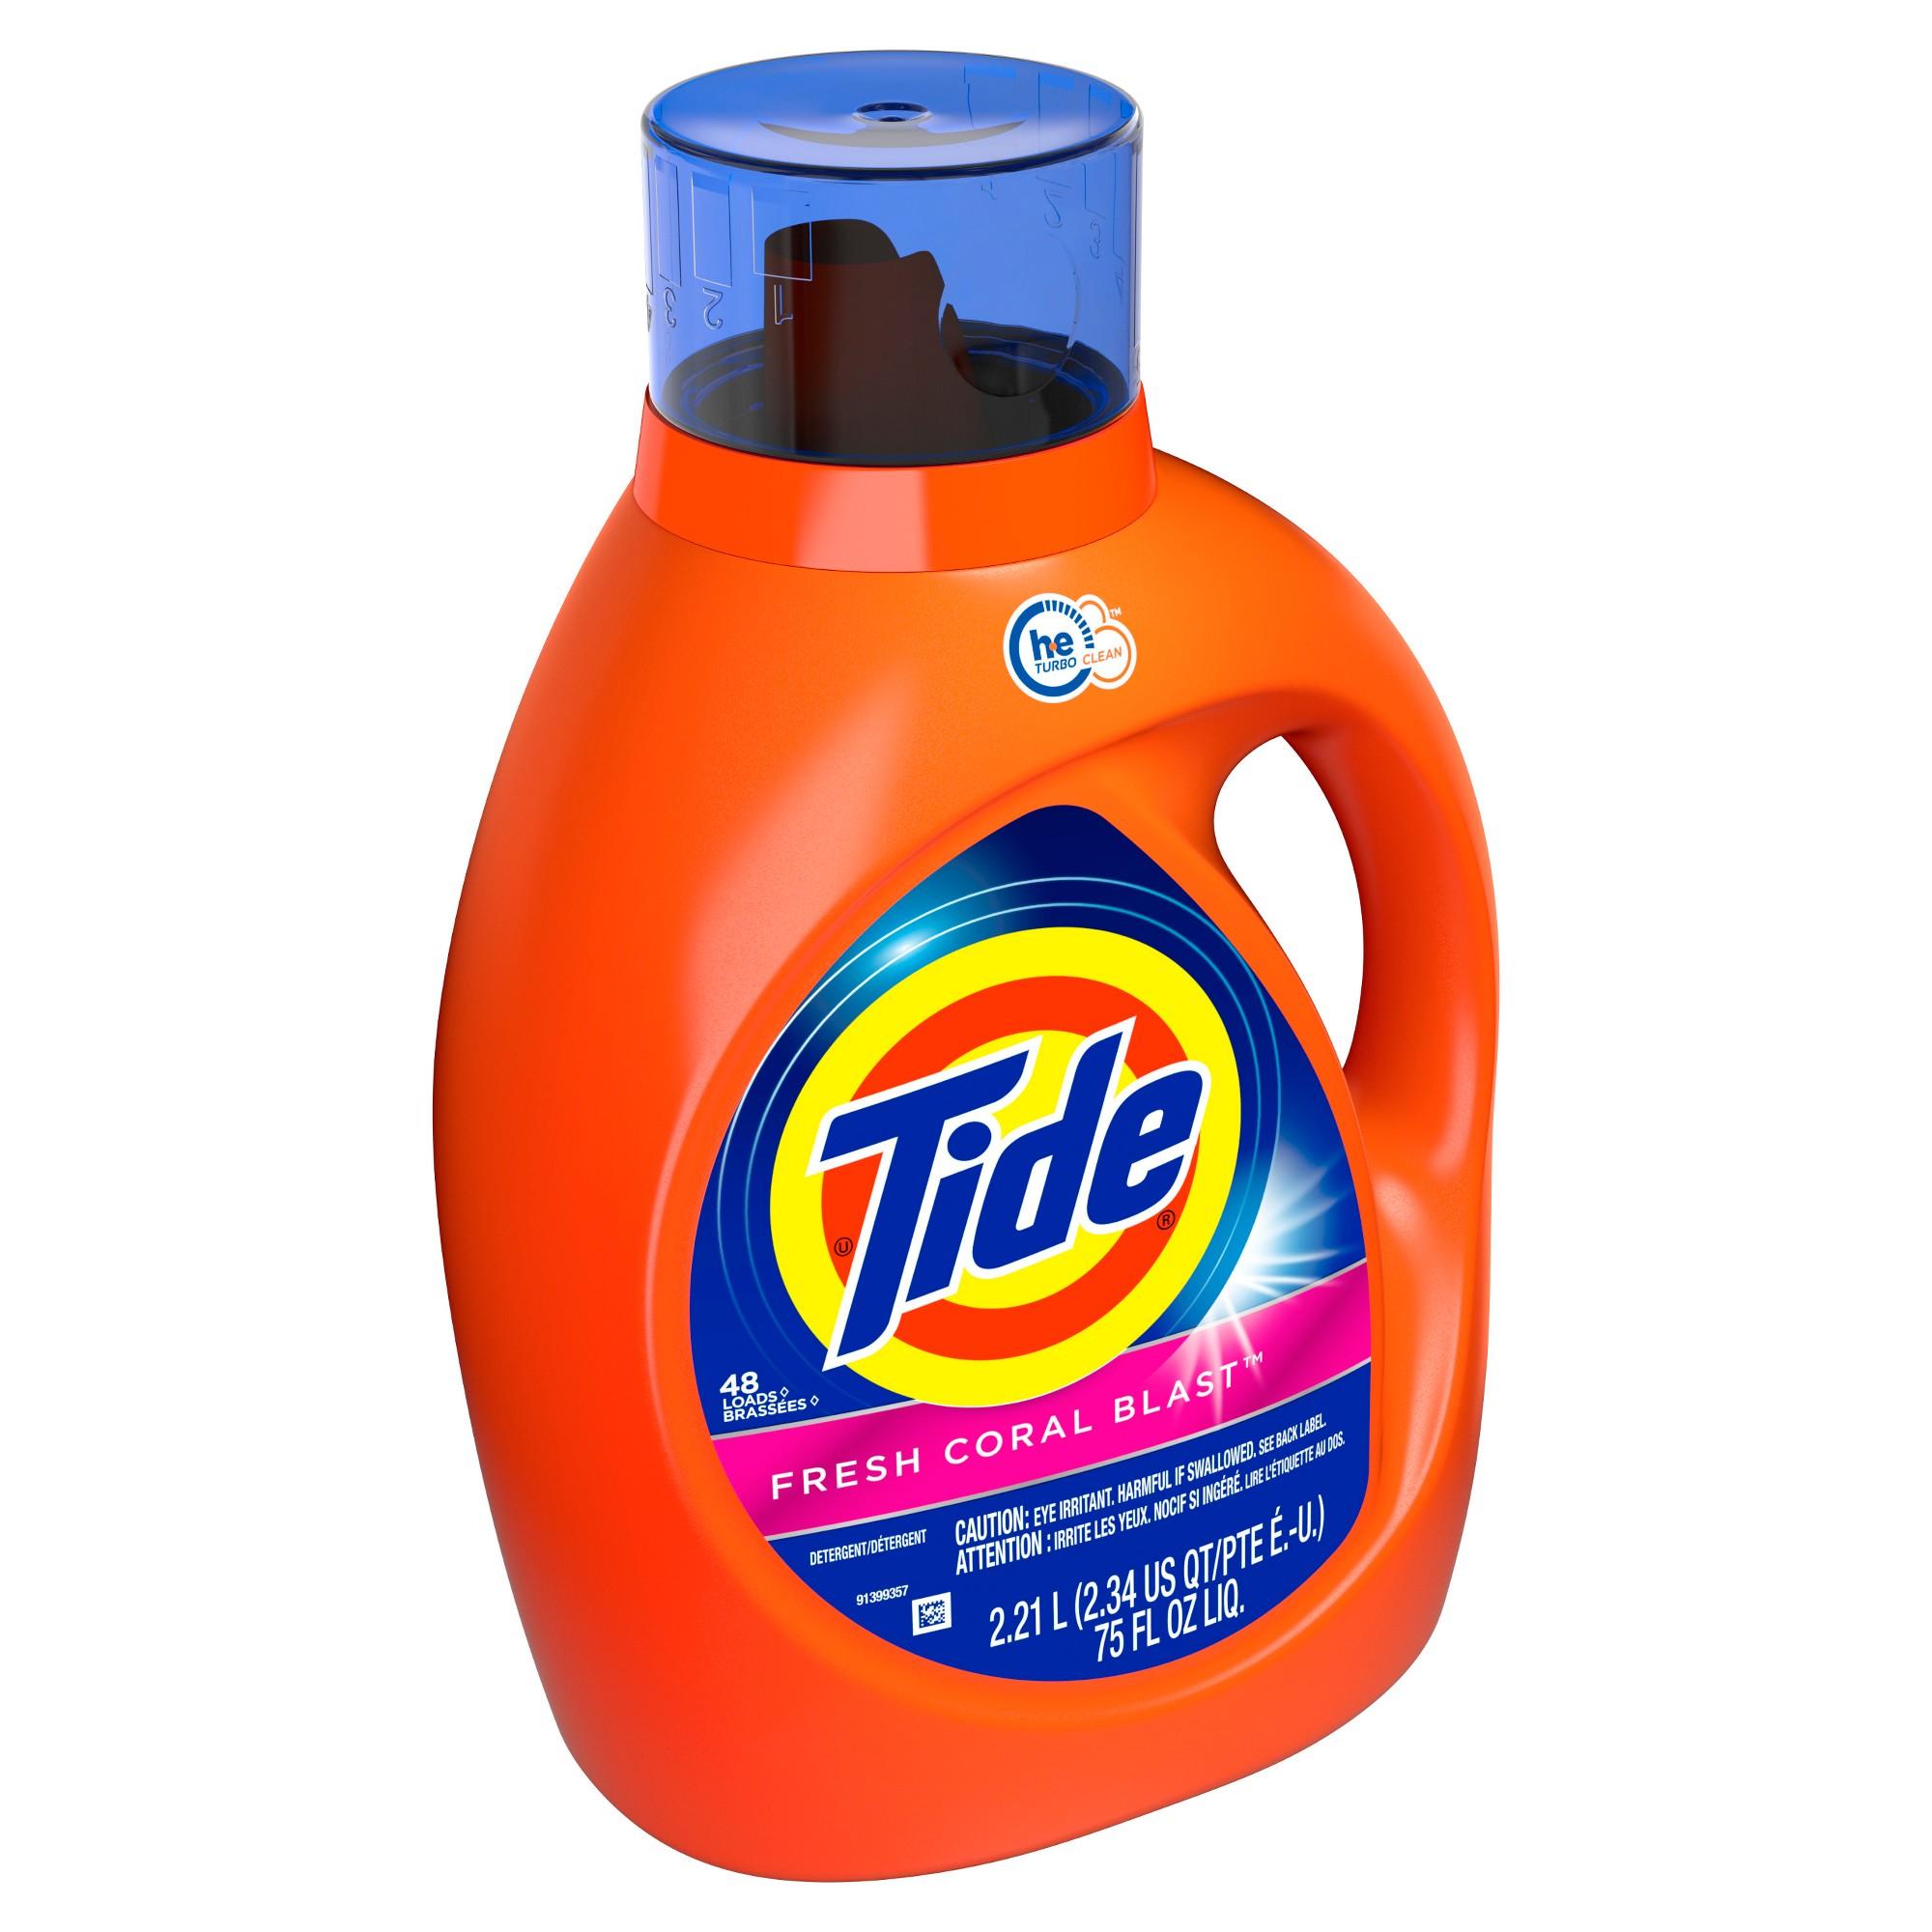 Tide Ultra Oxi Fresh Coral Blast Liquid Laundry Detergent 75oz